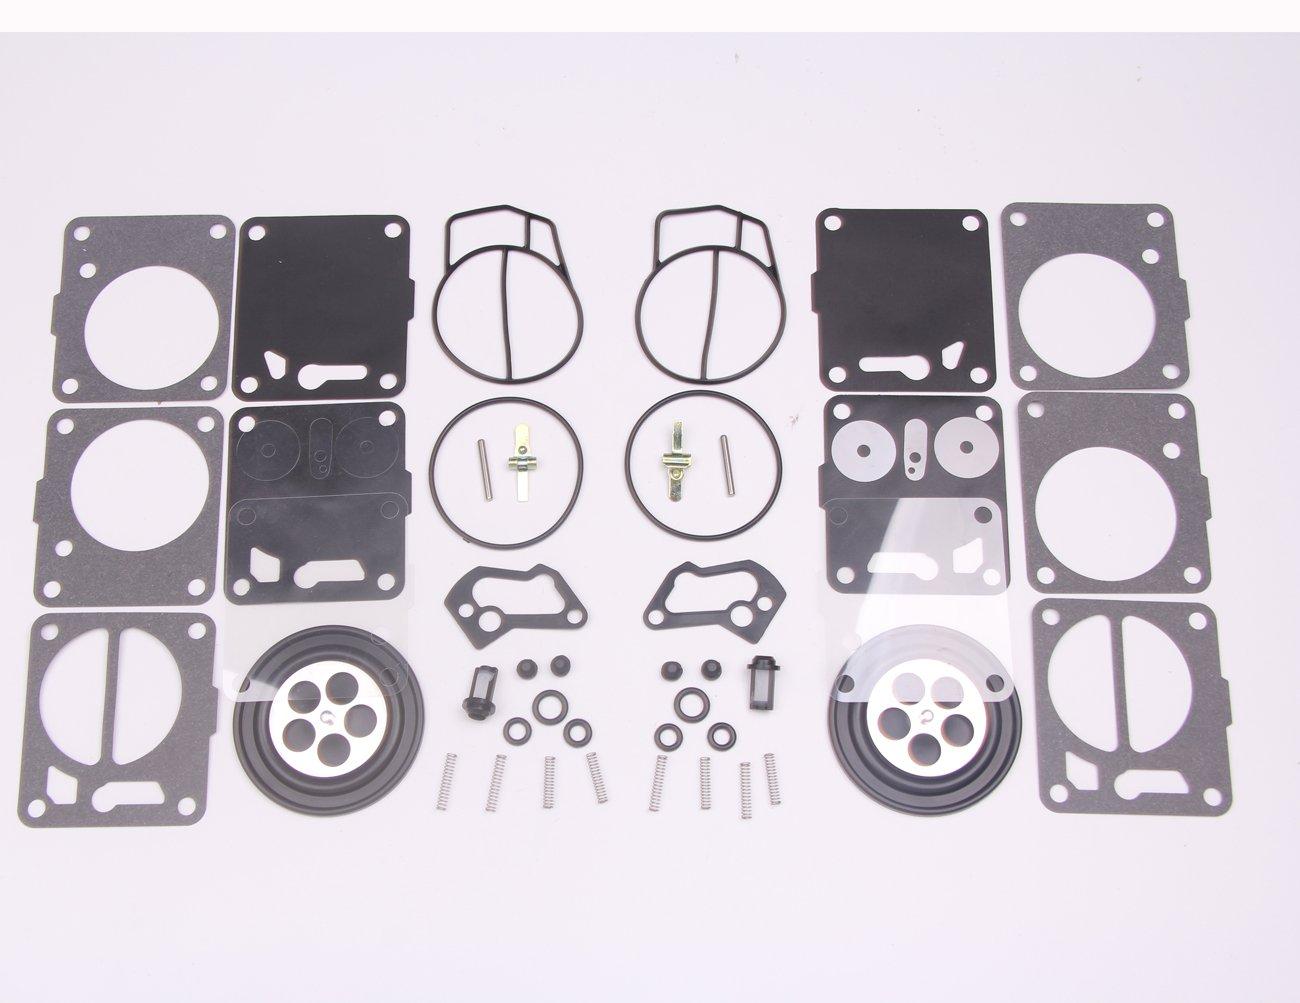 New 2 Sets Twin Carburetor Carb Repair Rebuild Kits For Mikuni Seadoo Gtx Fuse Box 50 717 720 787